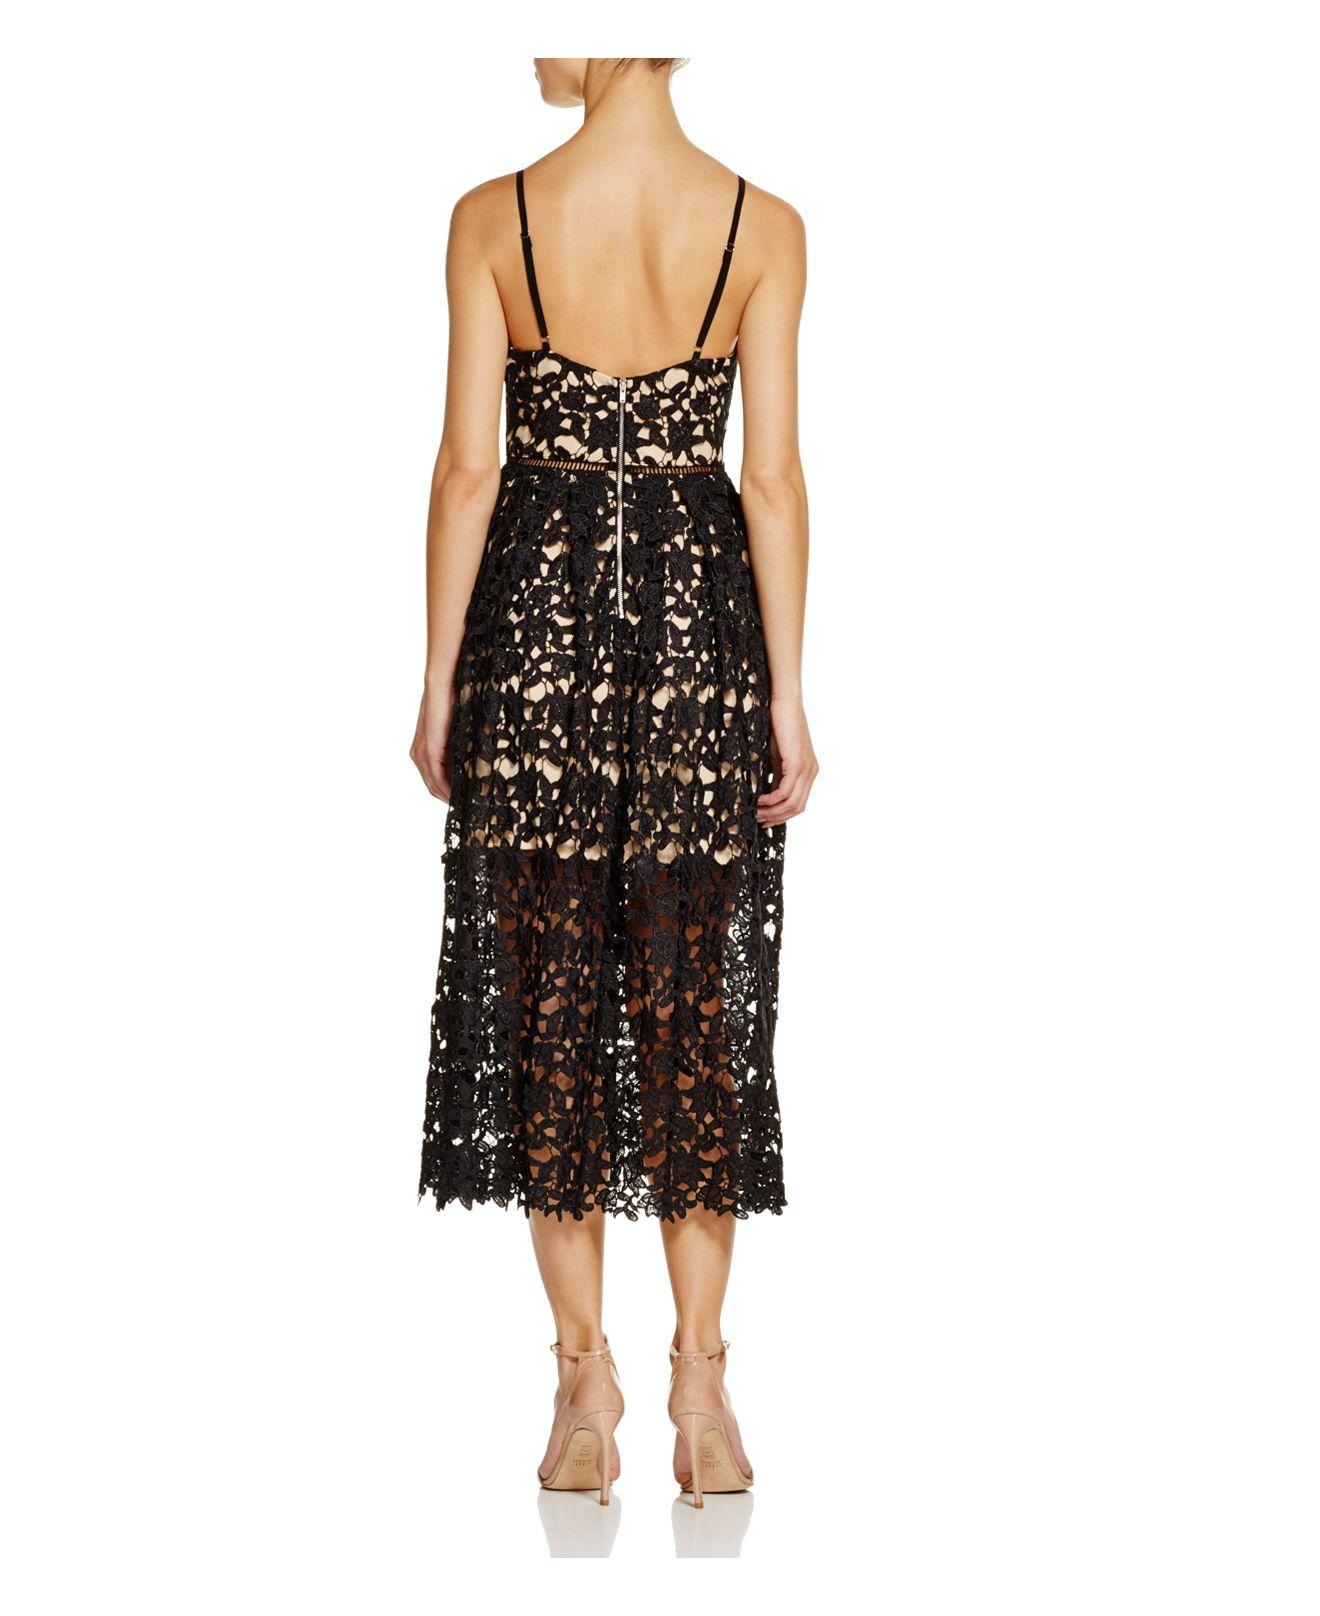 Aqua Lace Cami Midi Dress 100 Exclusive In Beige Black